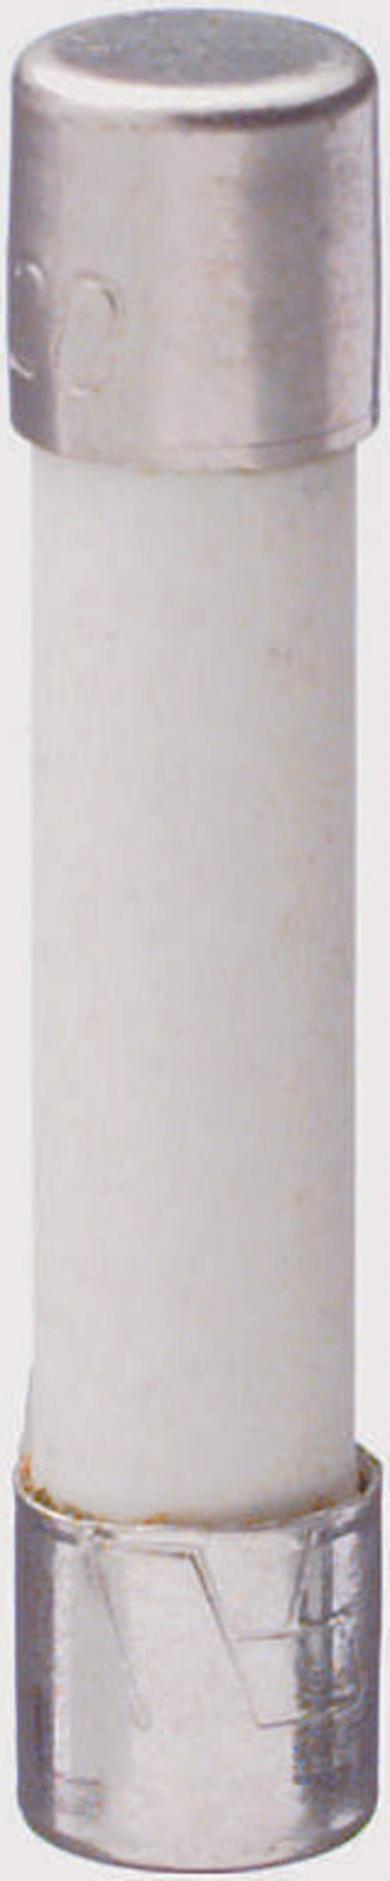 Siguranţă 6,4 x 31,8 mm ultrarapidă -FF- Eska tip GBB, 250 V/AC, 125 V/DC, 1,25 A